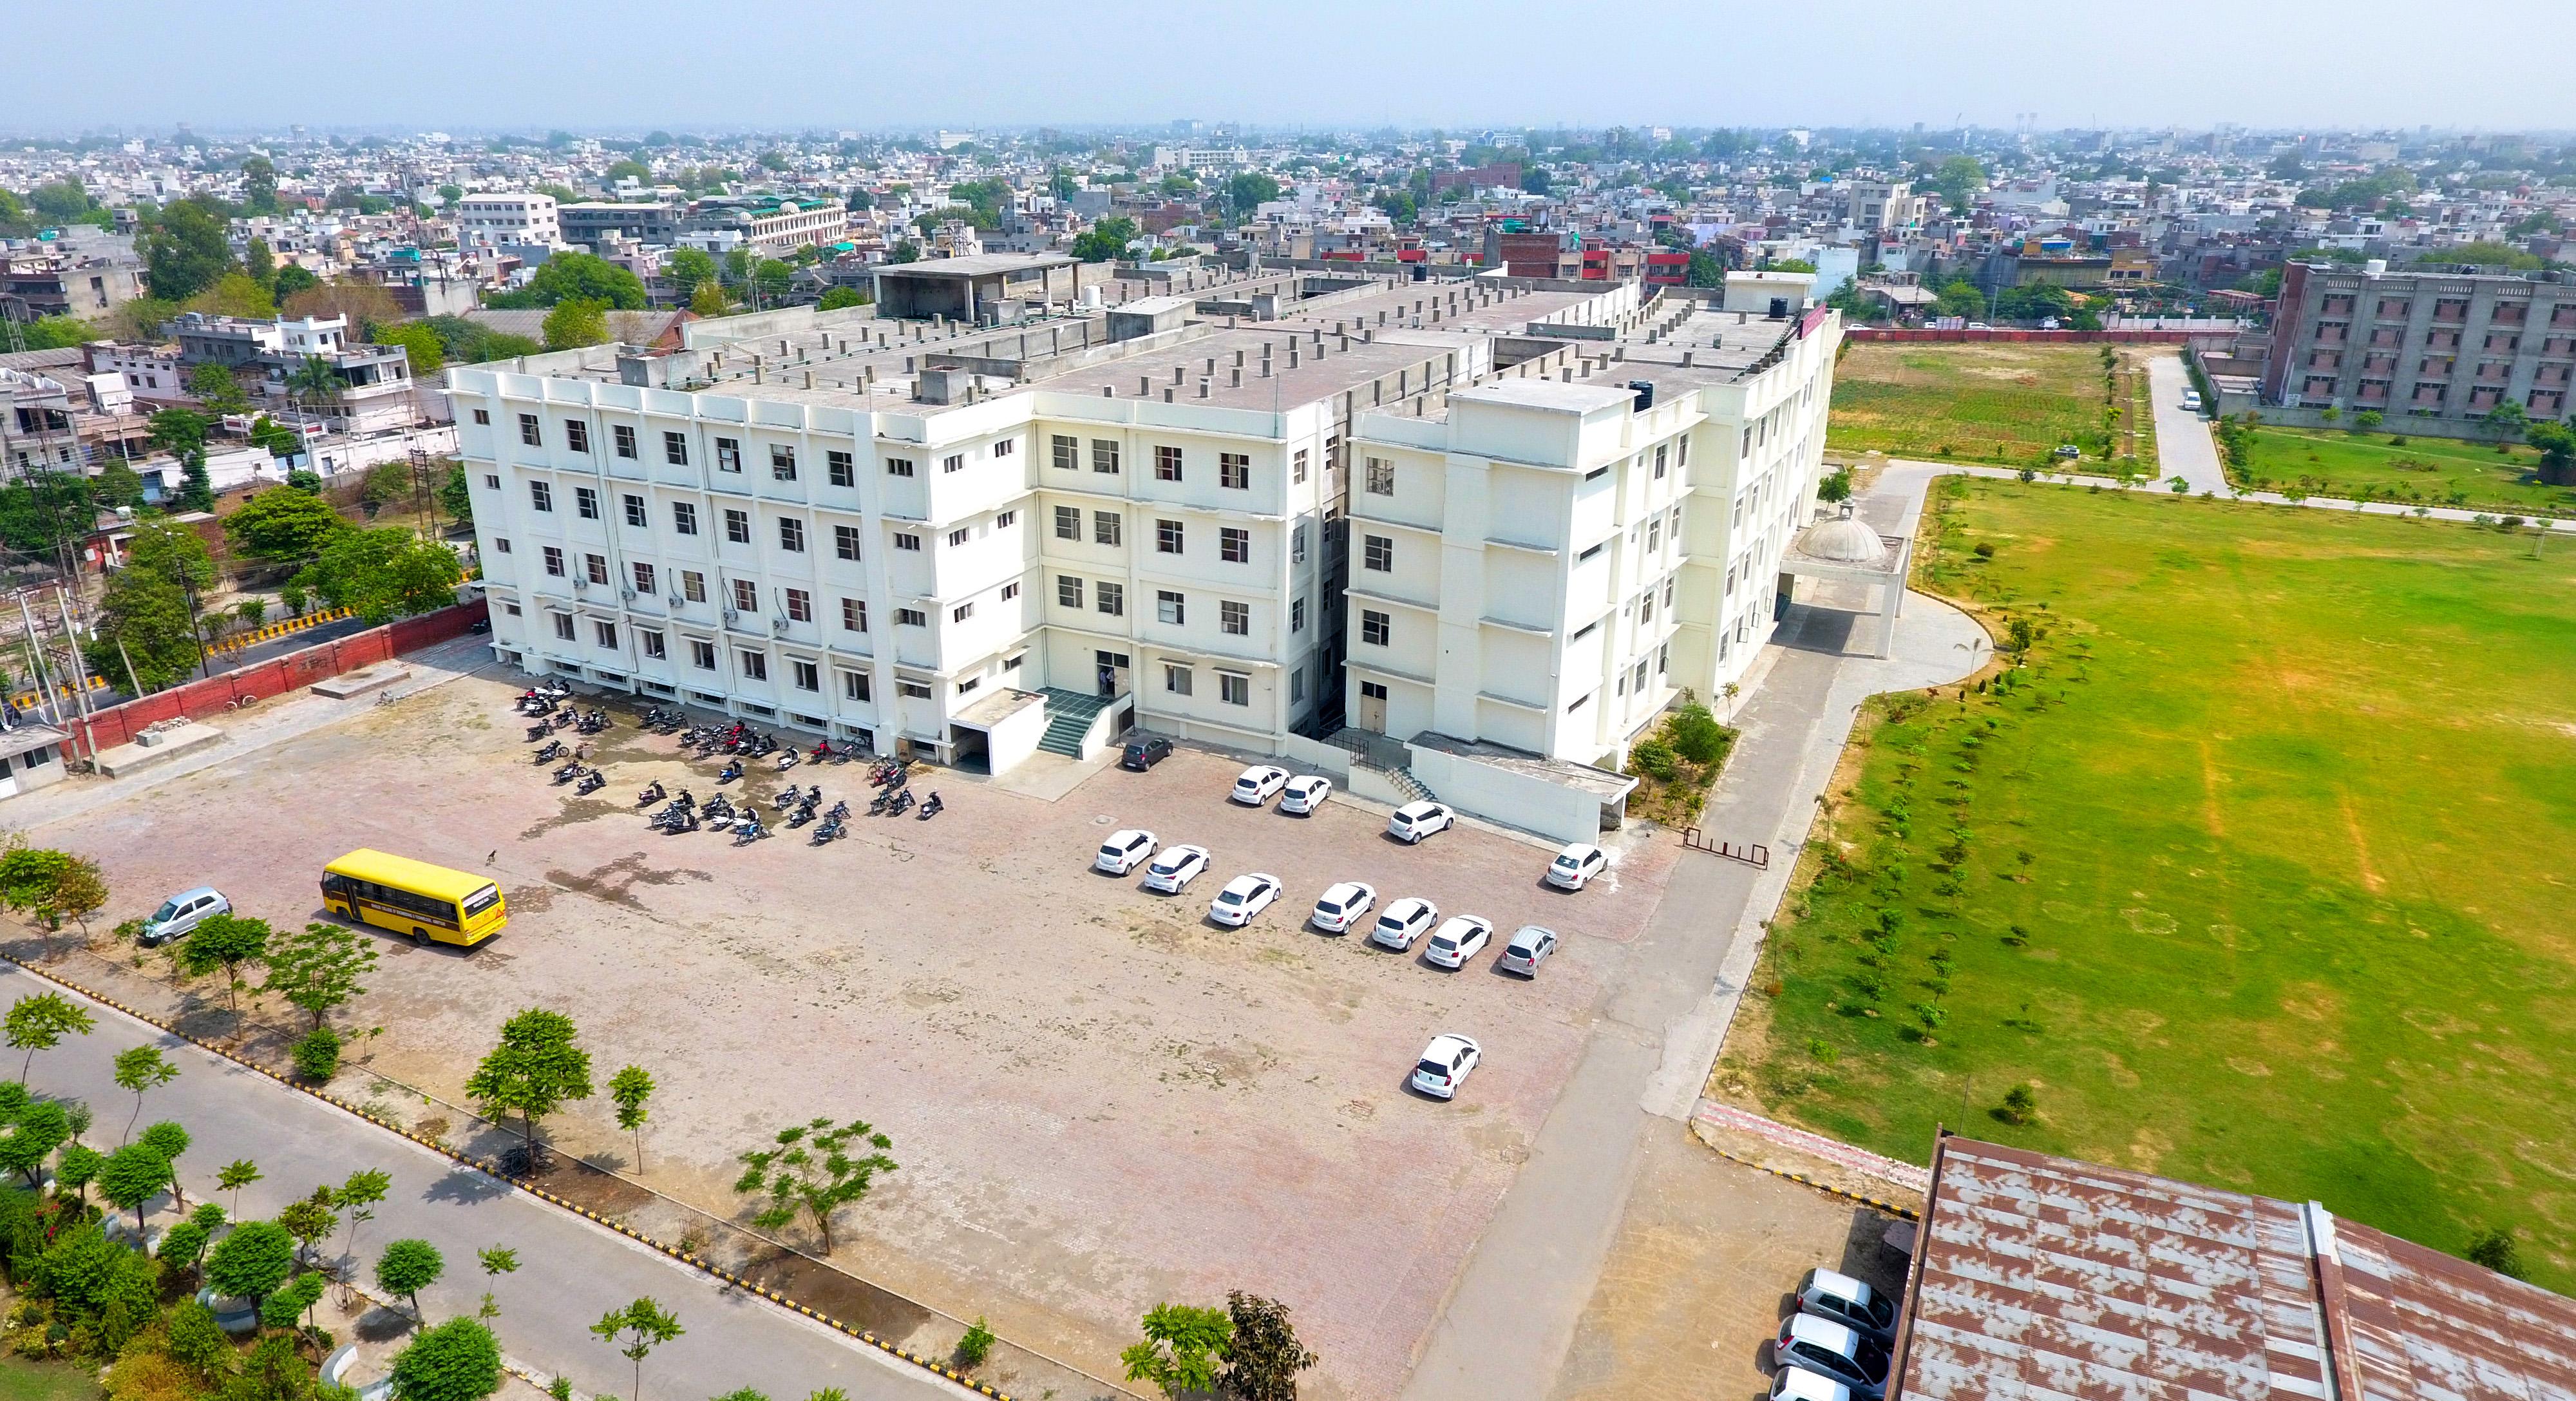 Khalsa College of Management and Technology, Amritsar